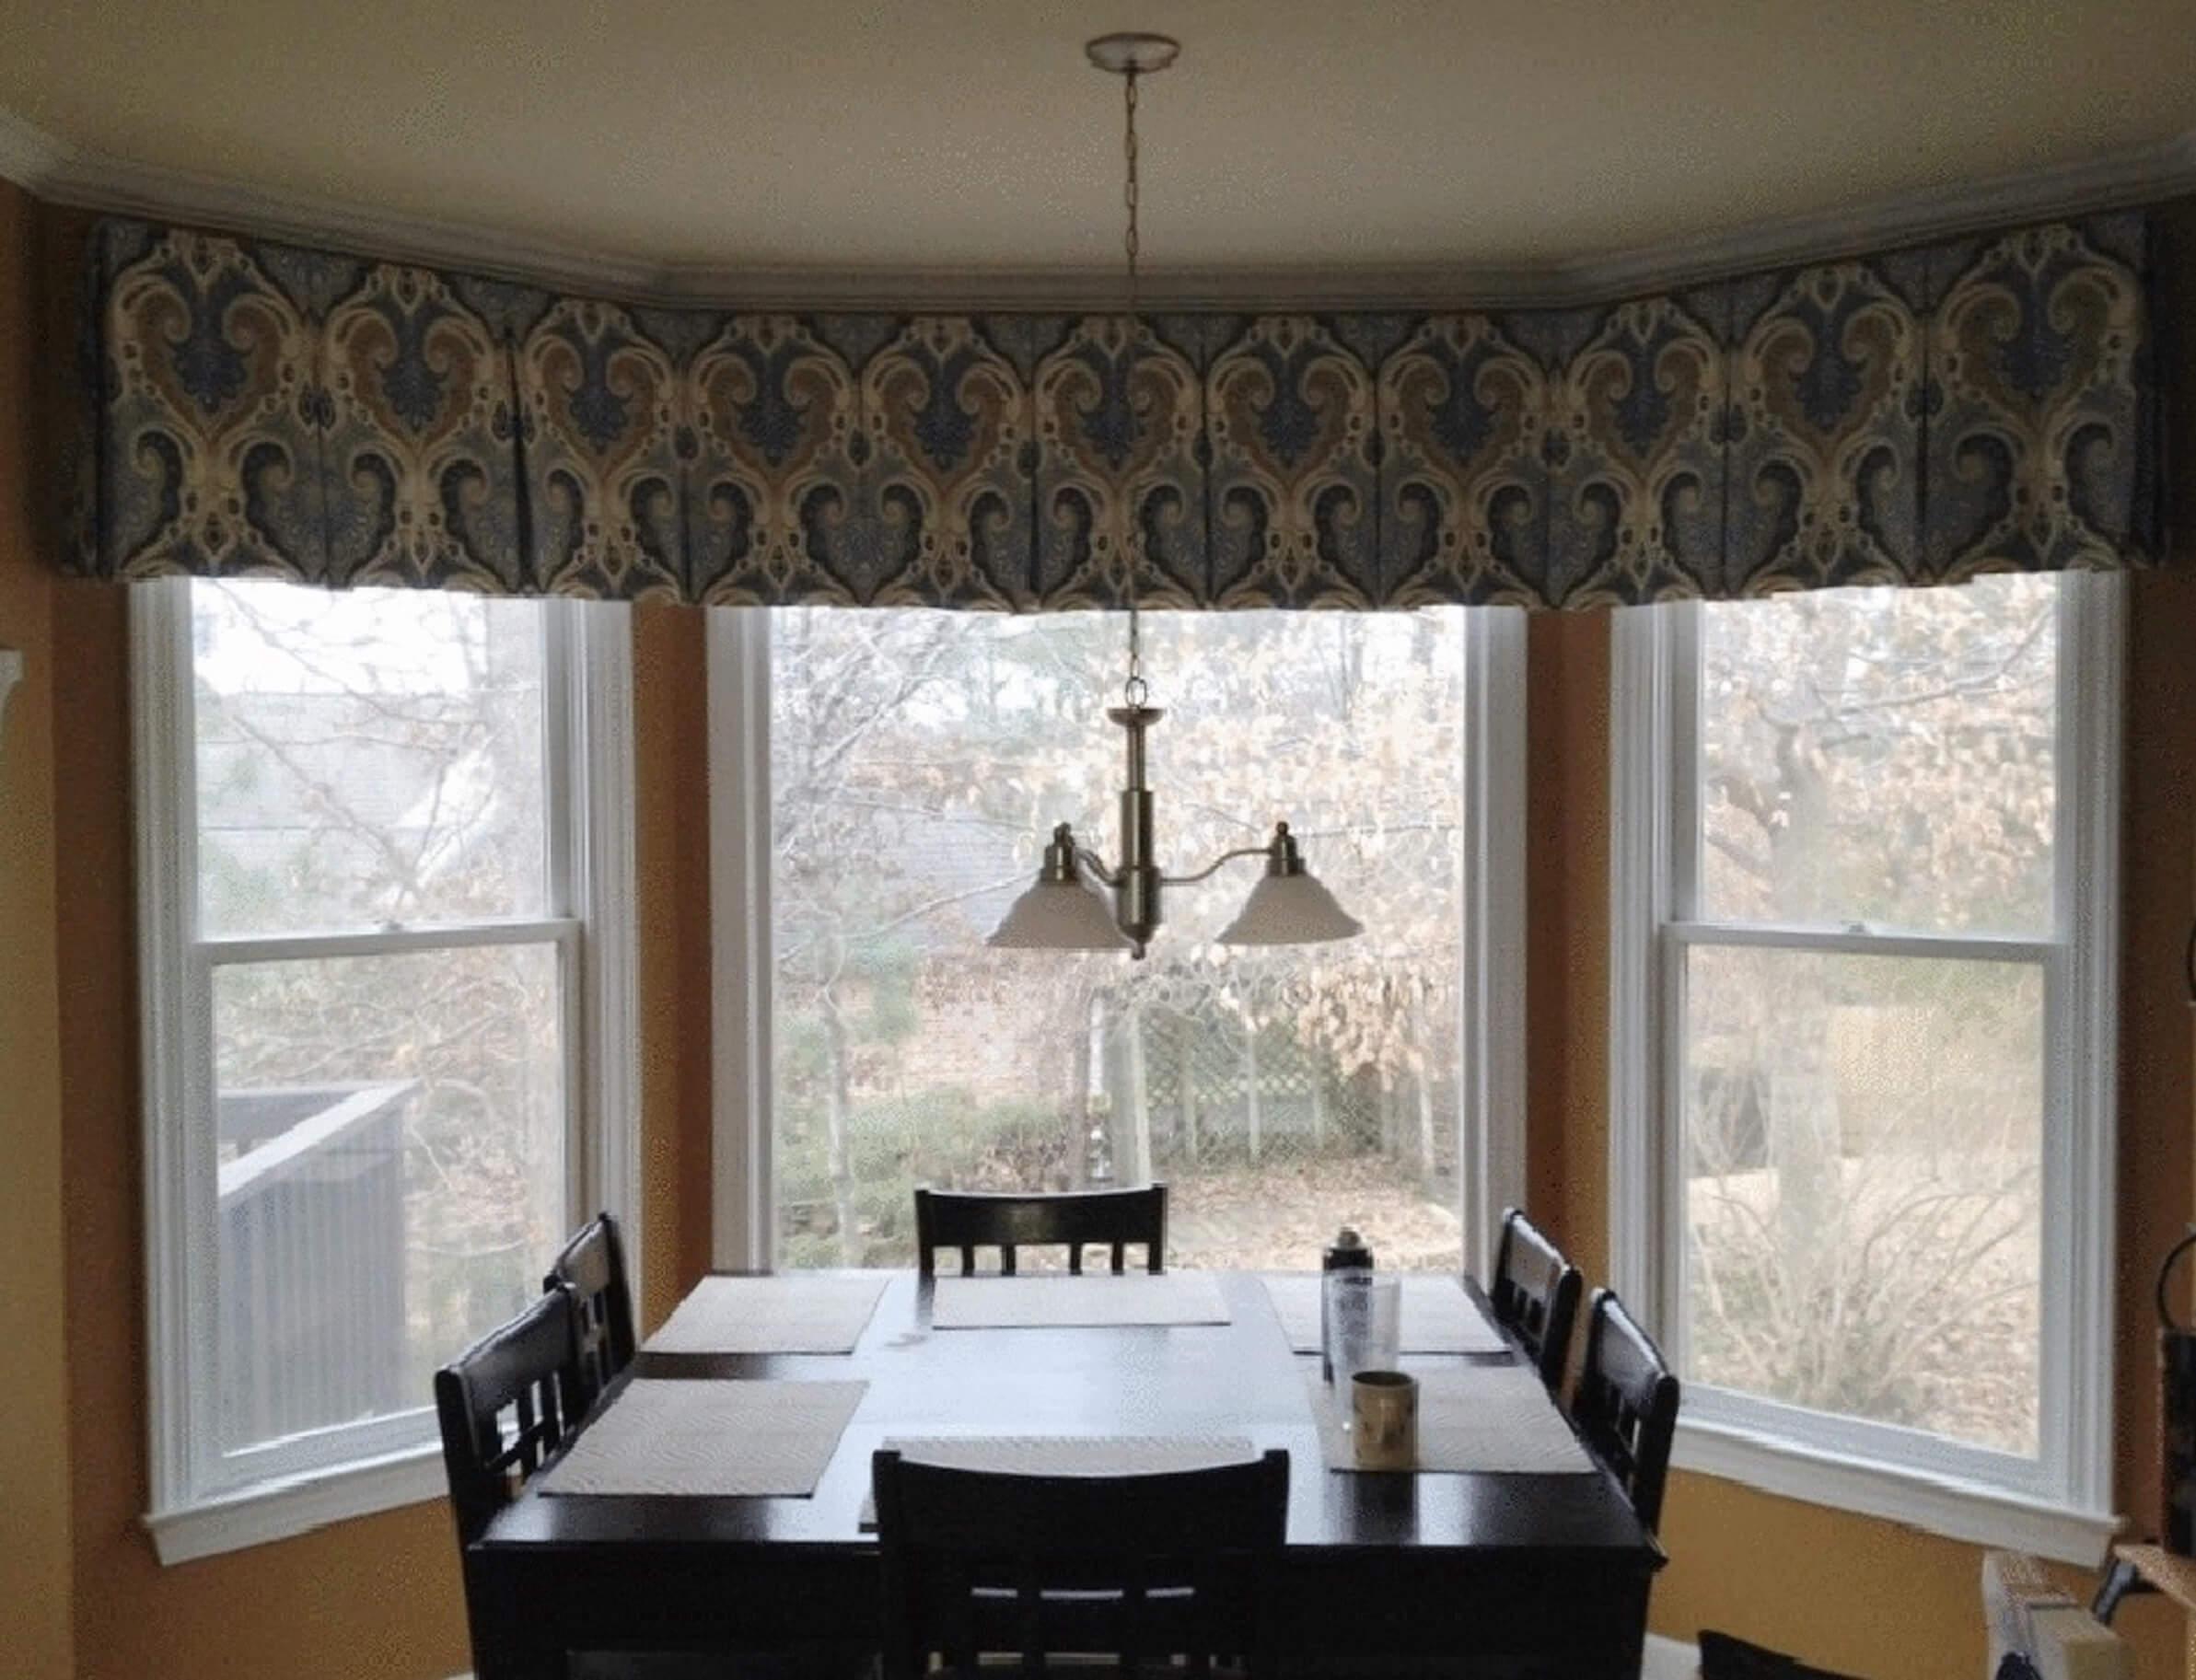 custom-blinds-drapery-shades-interior-design-atlanta-georgia-38.jpg